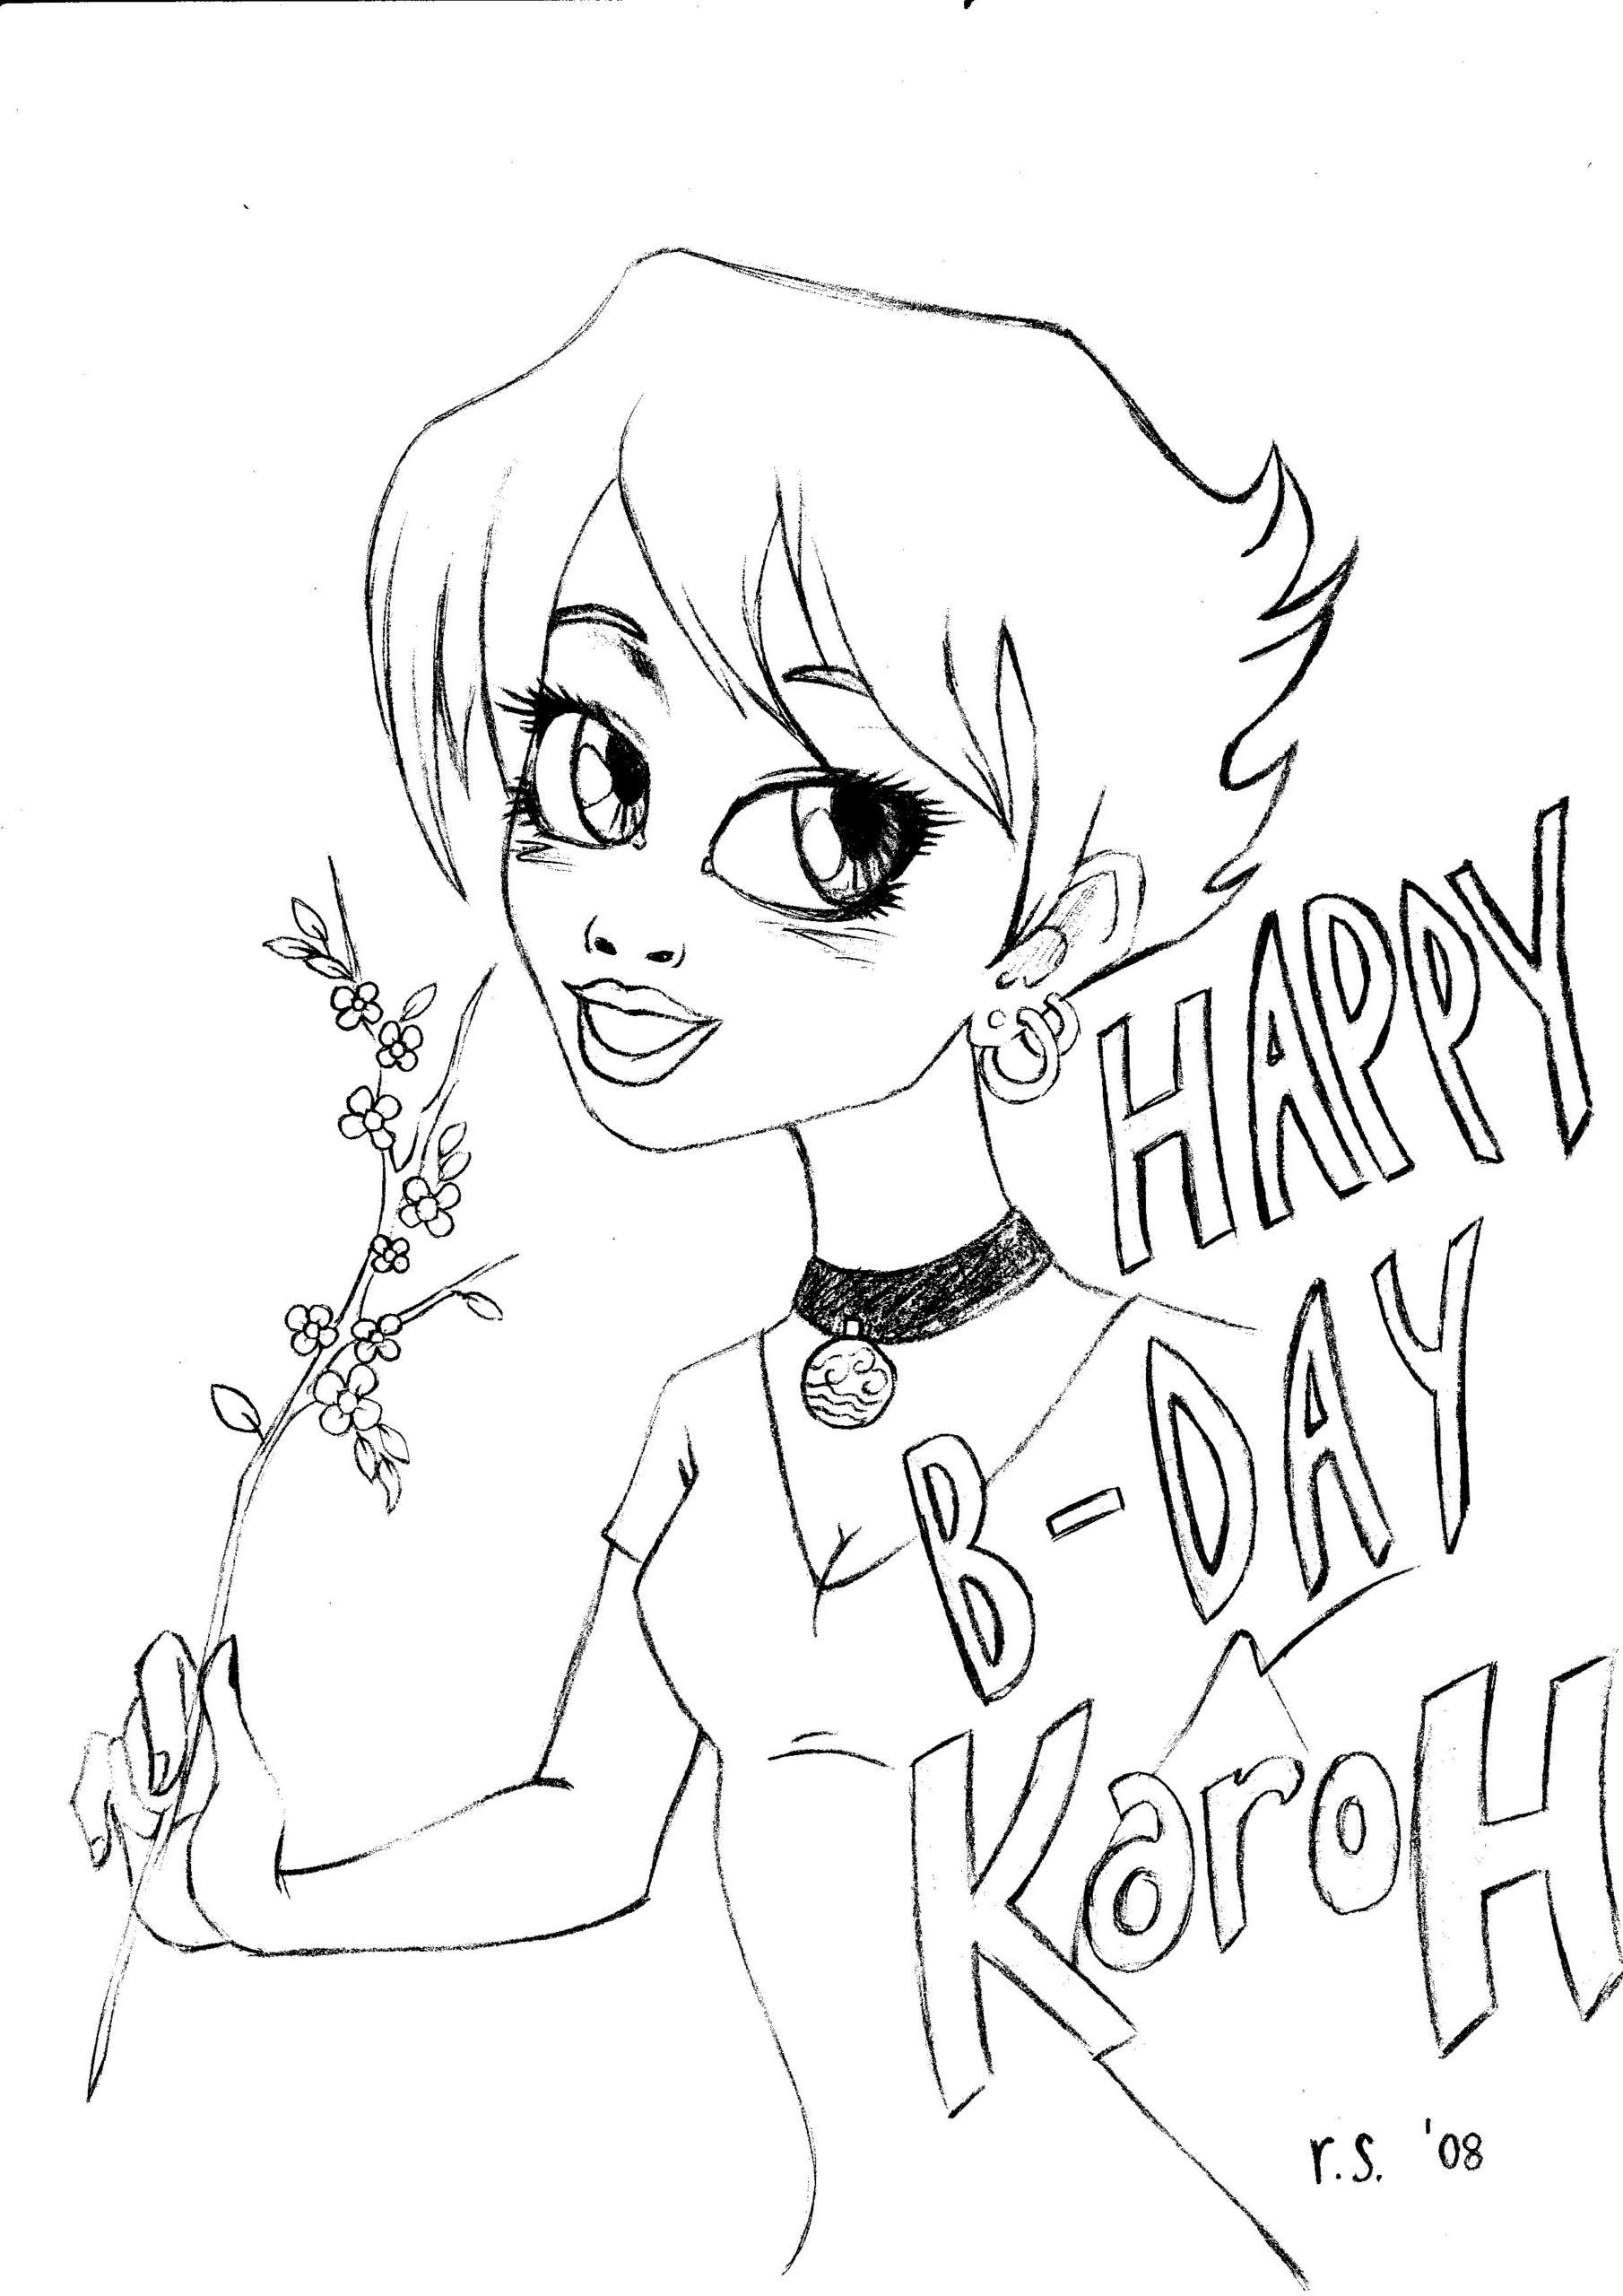 HAPPY BIRTHDAY KaroH 3 doodles